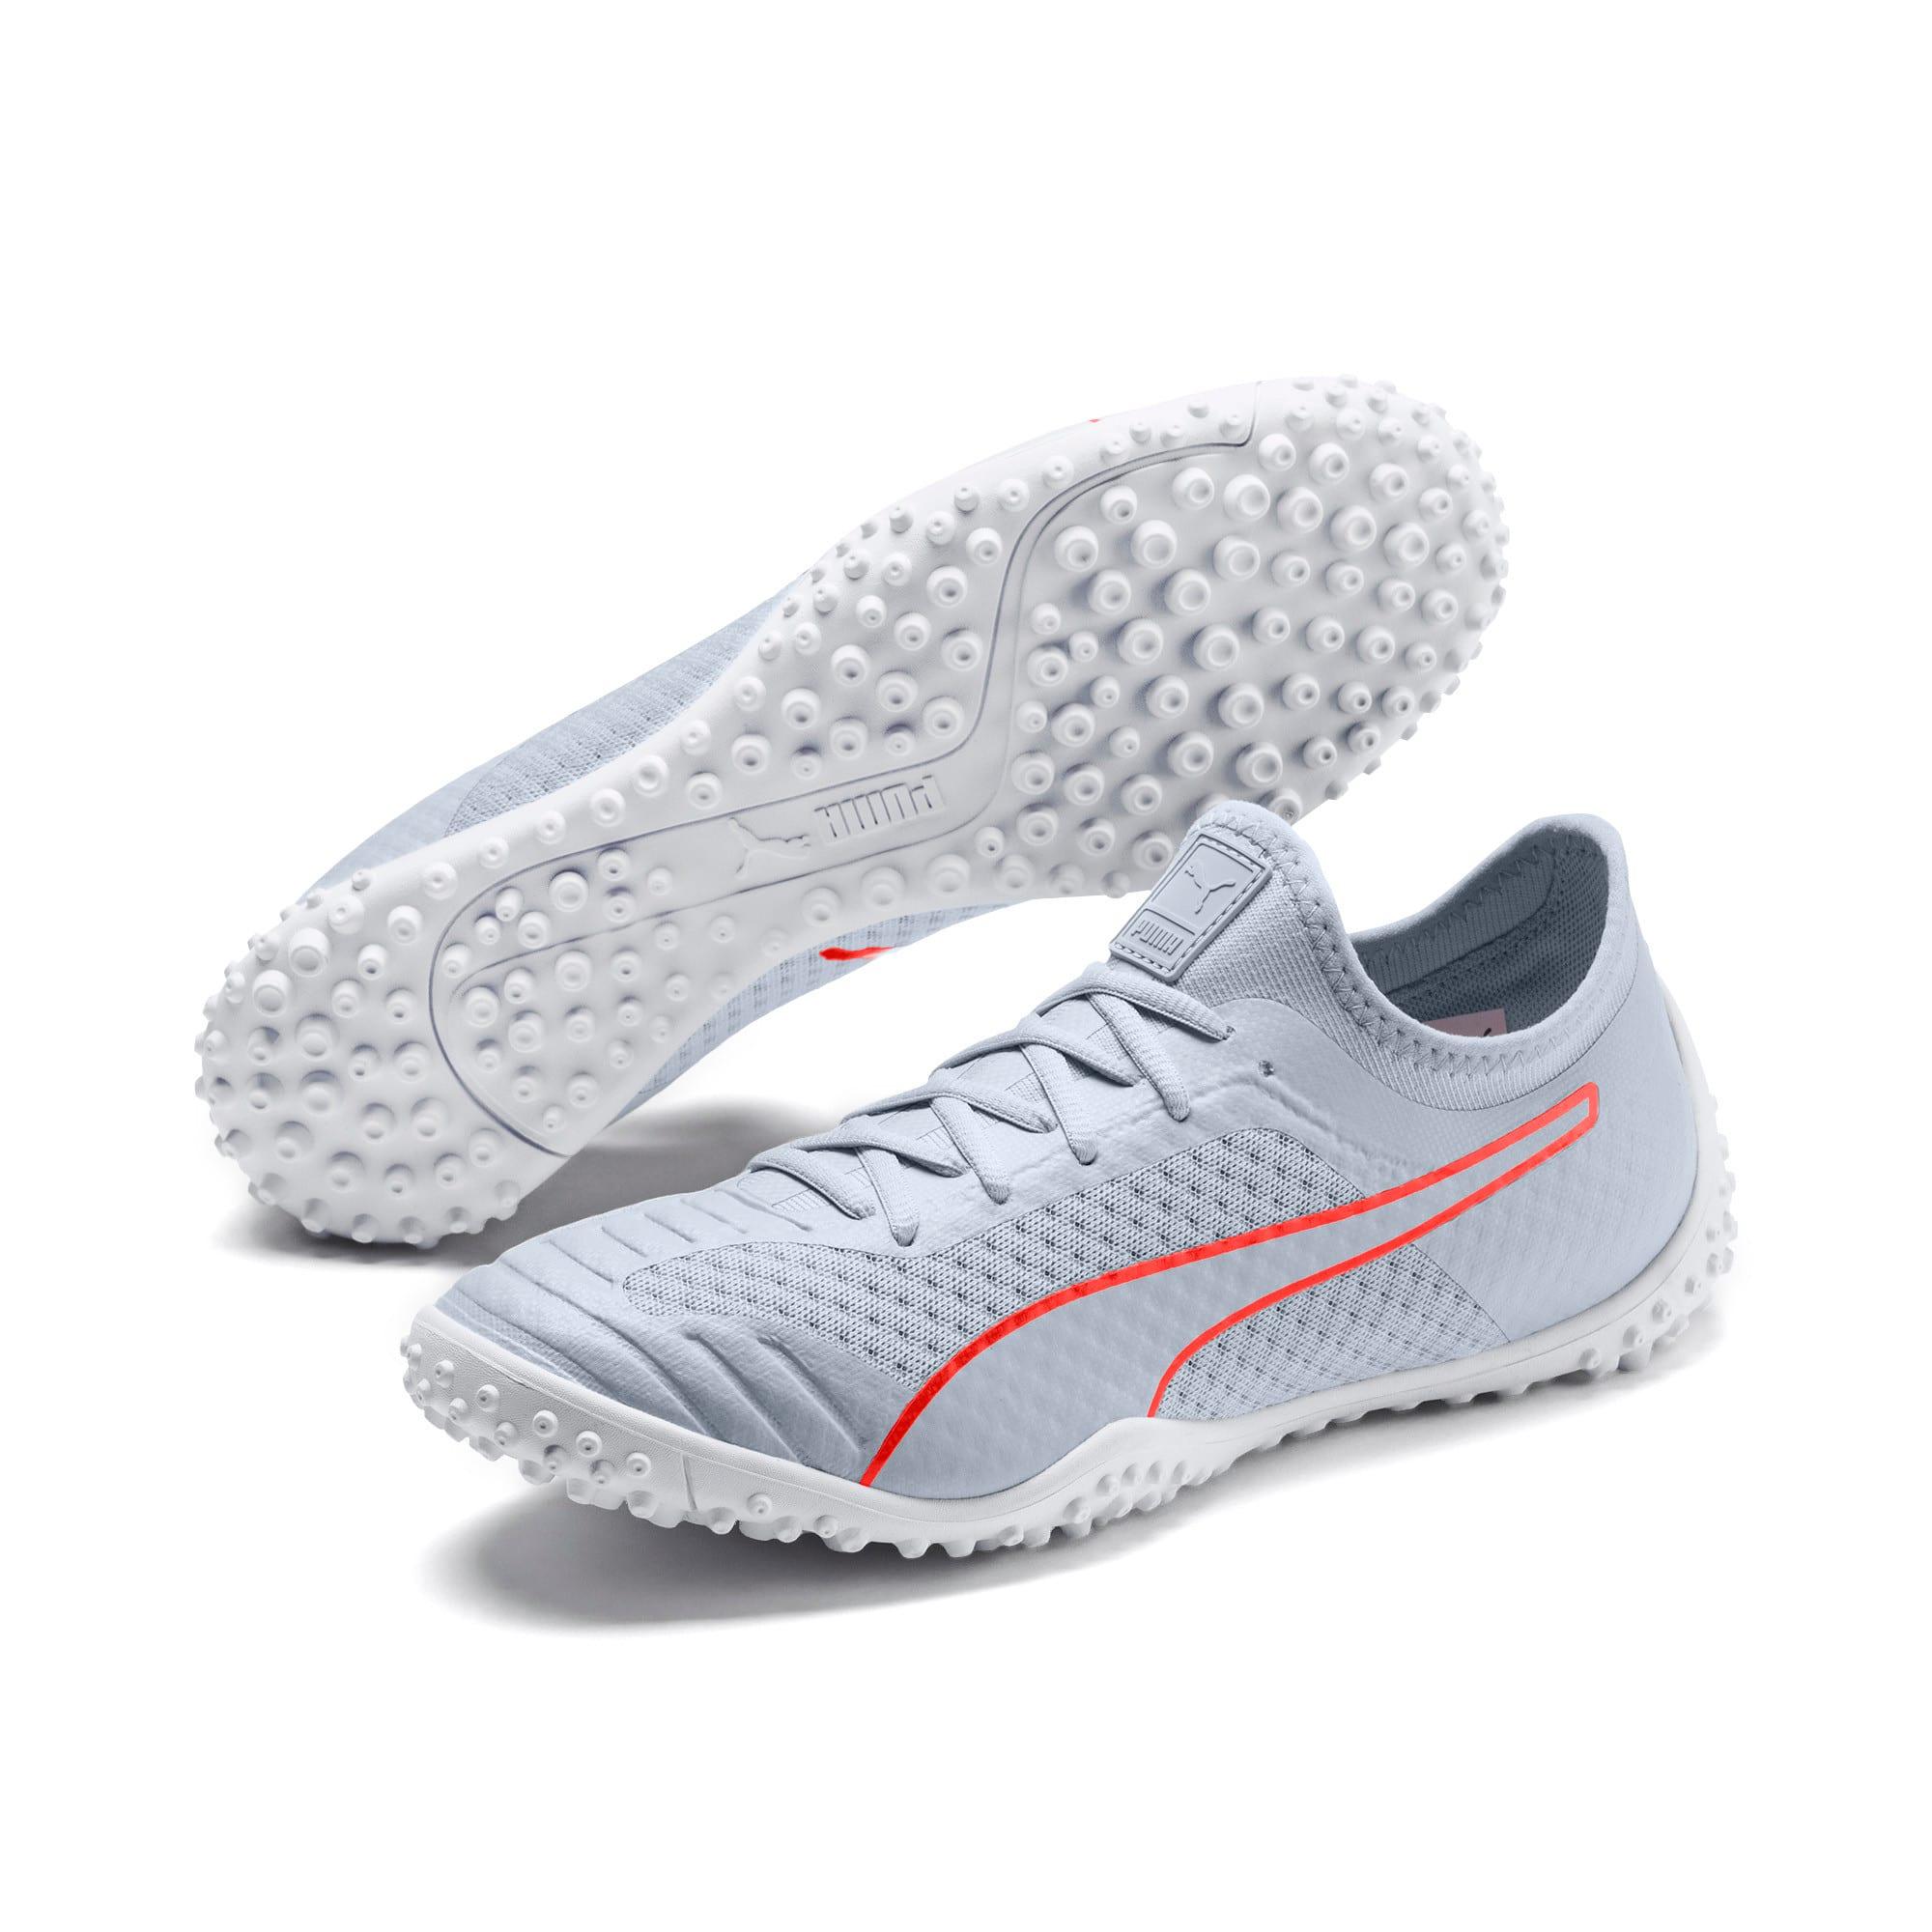 Thumbnail 2 of 365 Concrete 2 ST Men's Soccer Shoes, Grey Dawn-Nrgy Red-White, medium